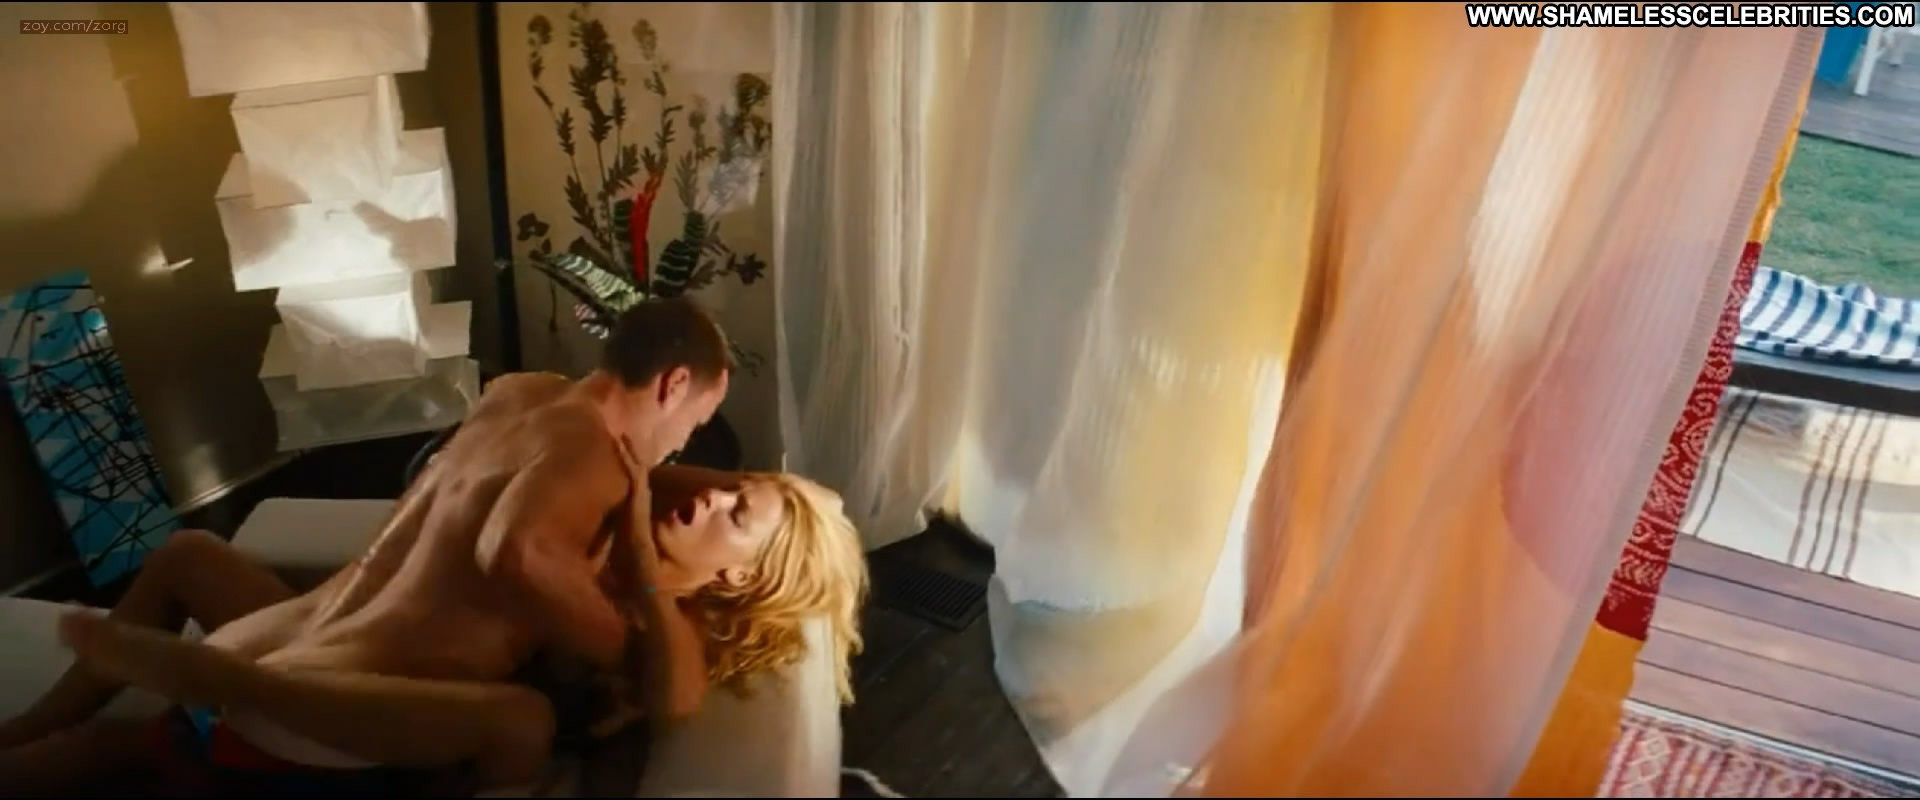 Stimulation through breasts videos